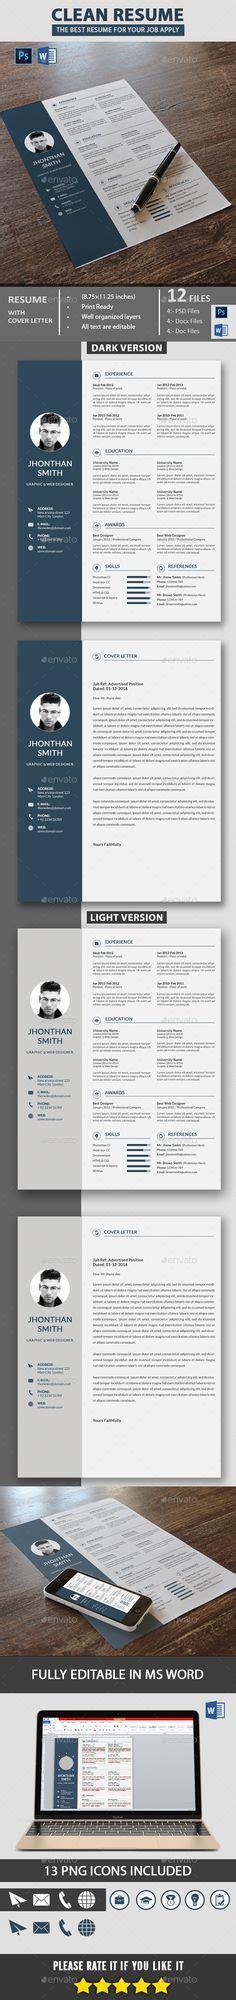 colorful graphic design resume cv